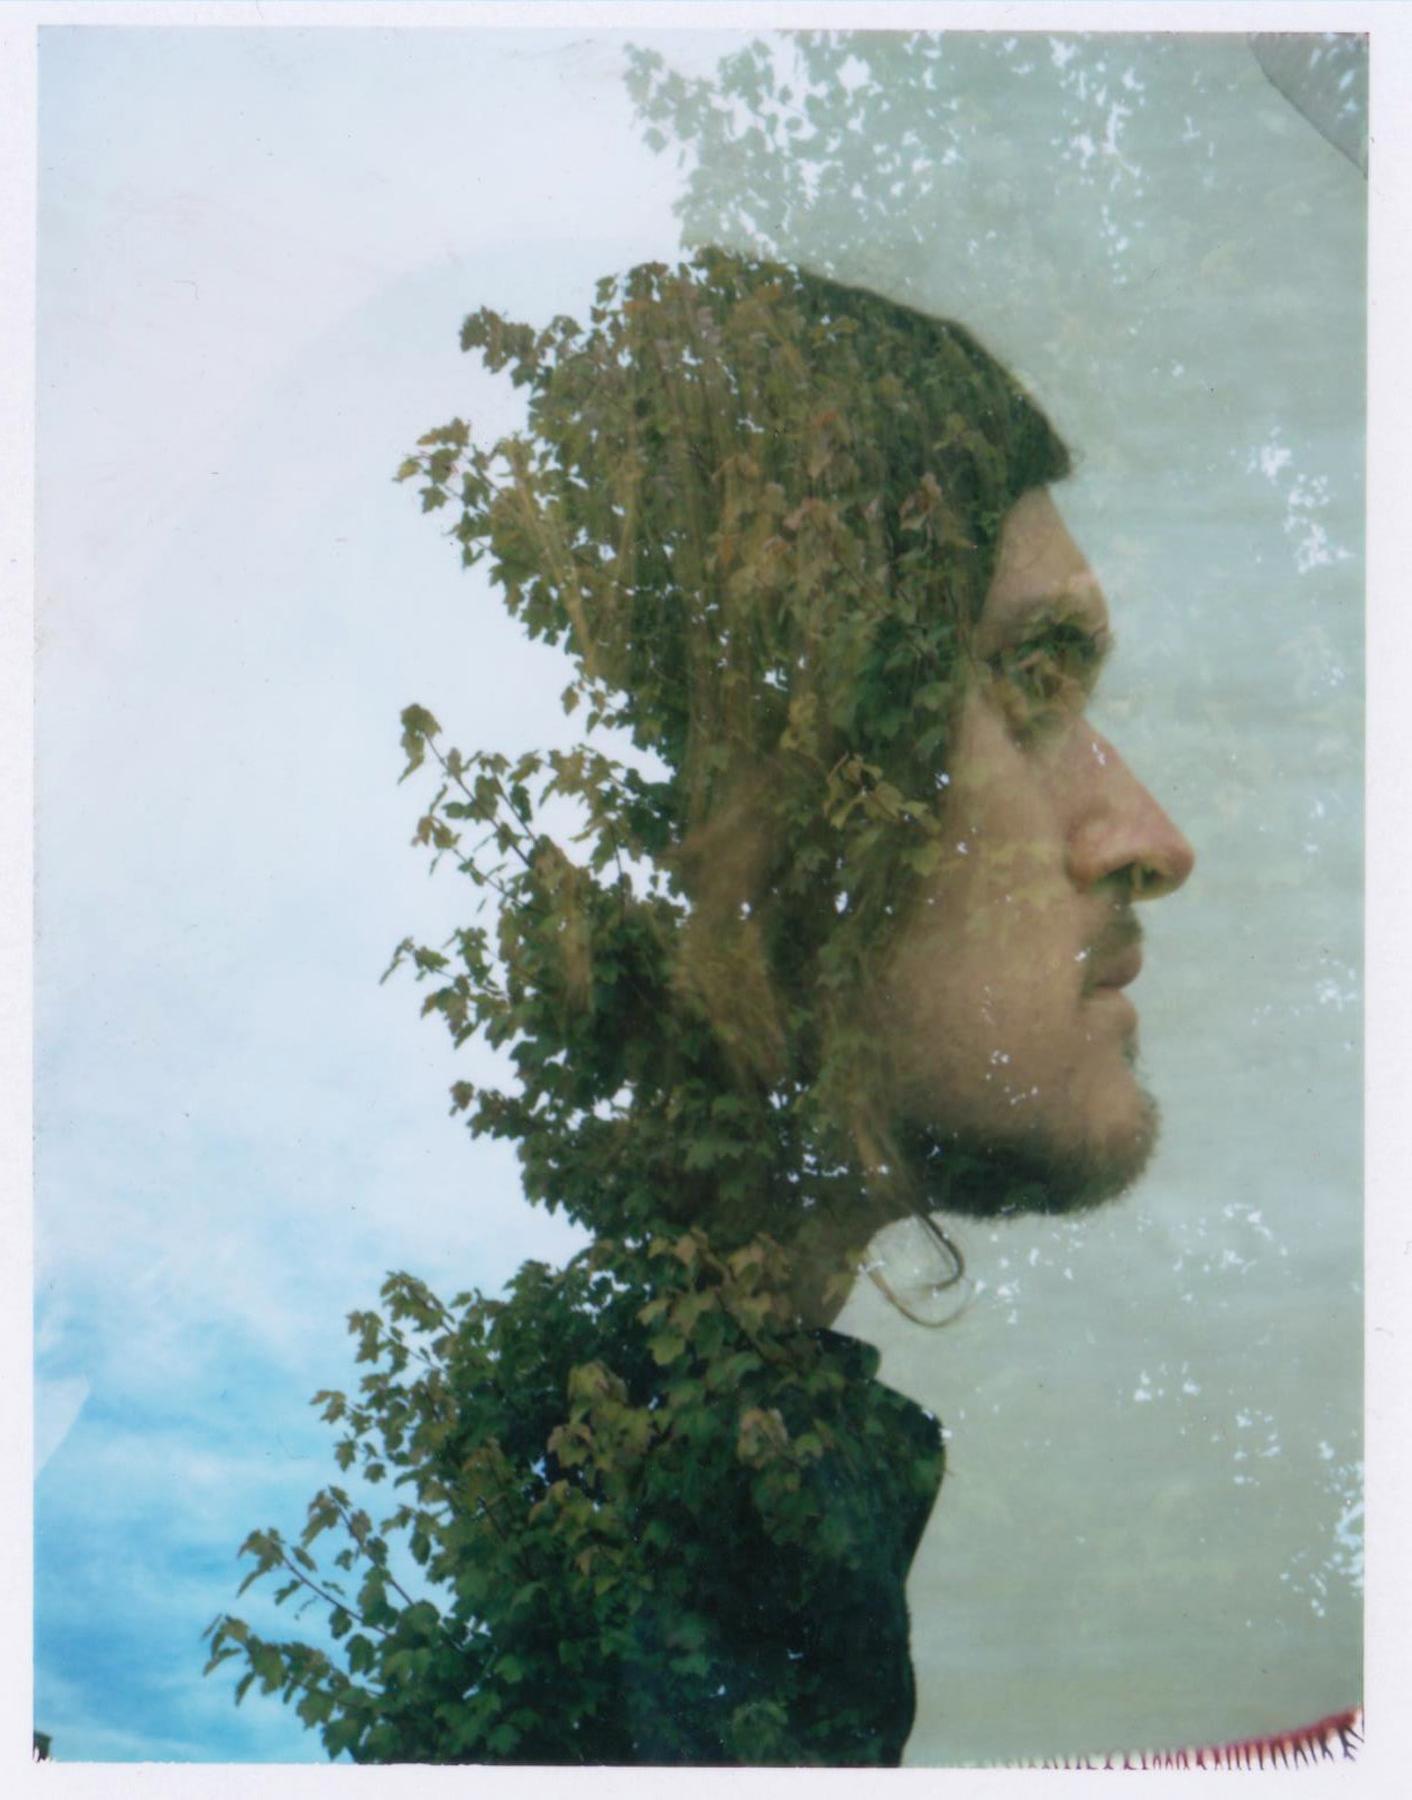 Abigail Crone | Into The Trees | Polaroid 230 Land Camera | FP-100C